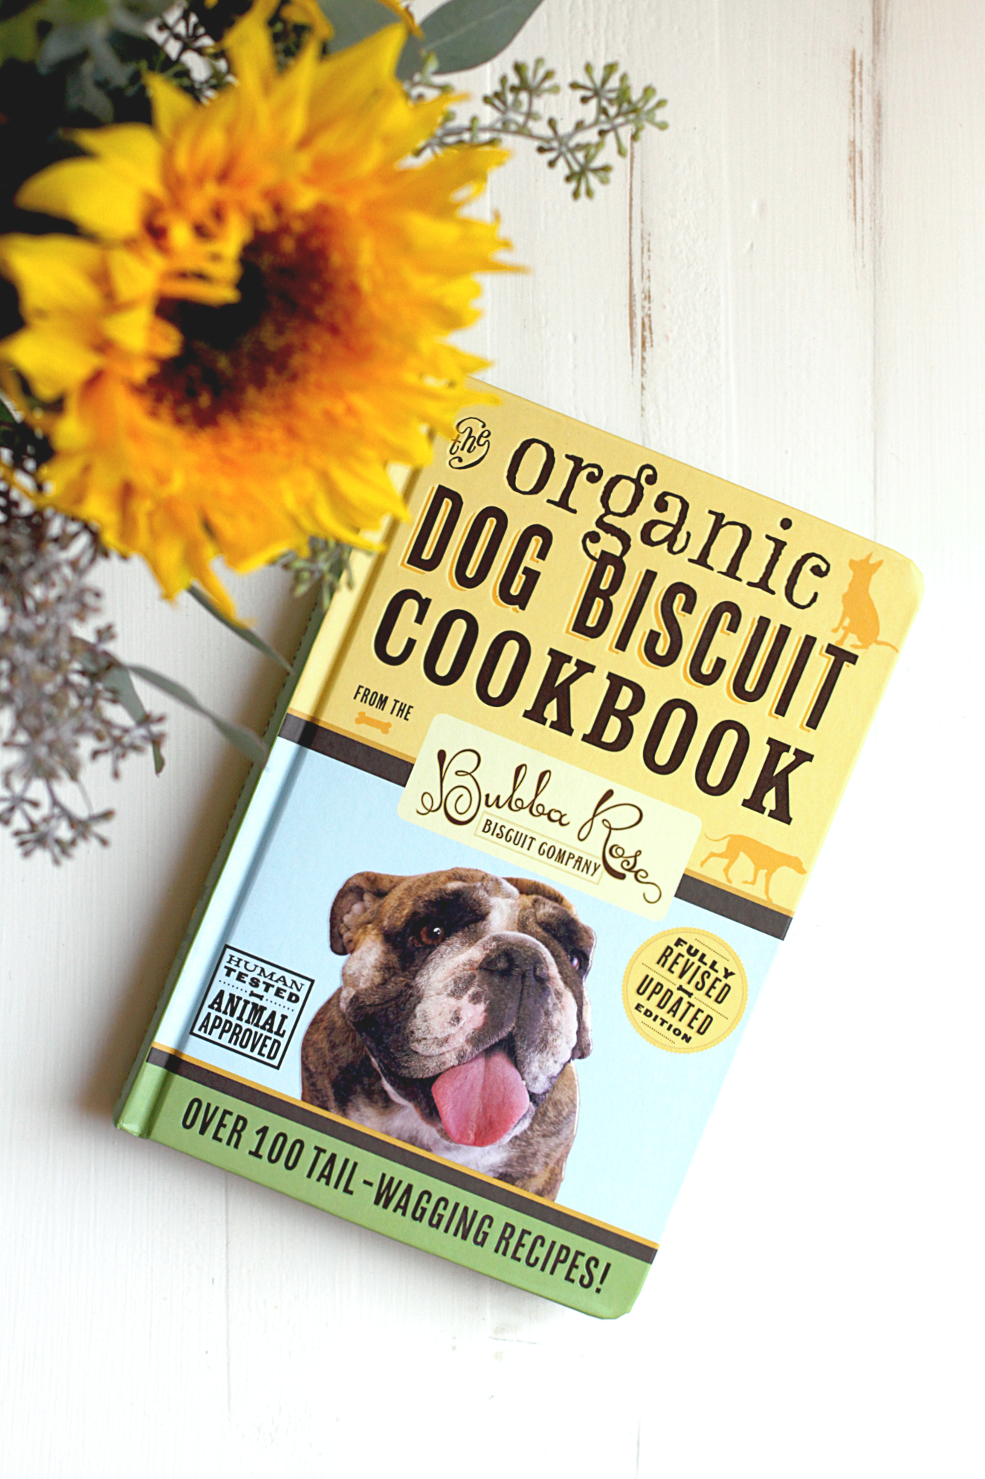 Bubba Rose Organic Dog Biscuit Cookbook